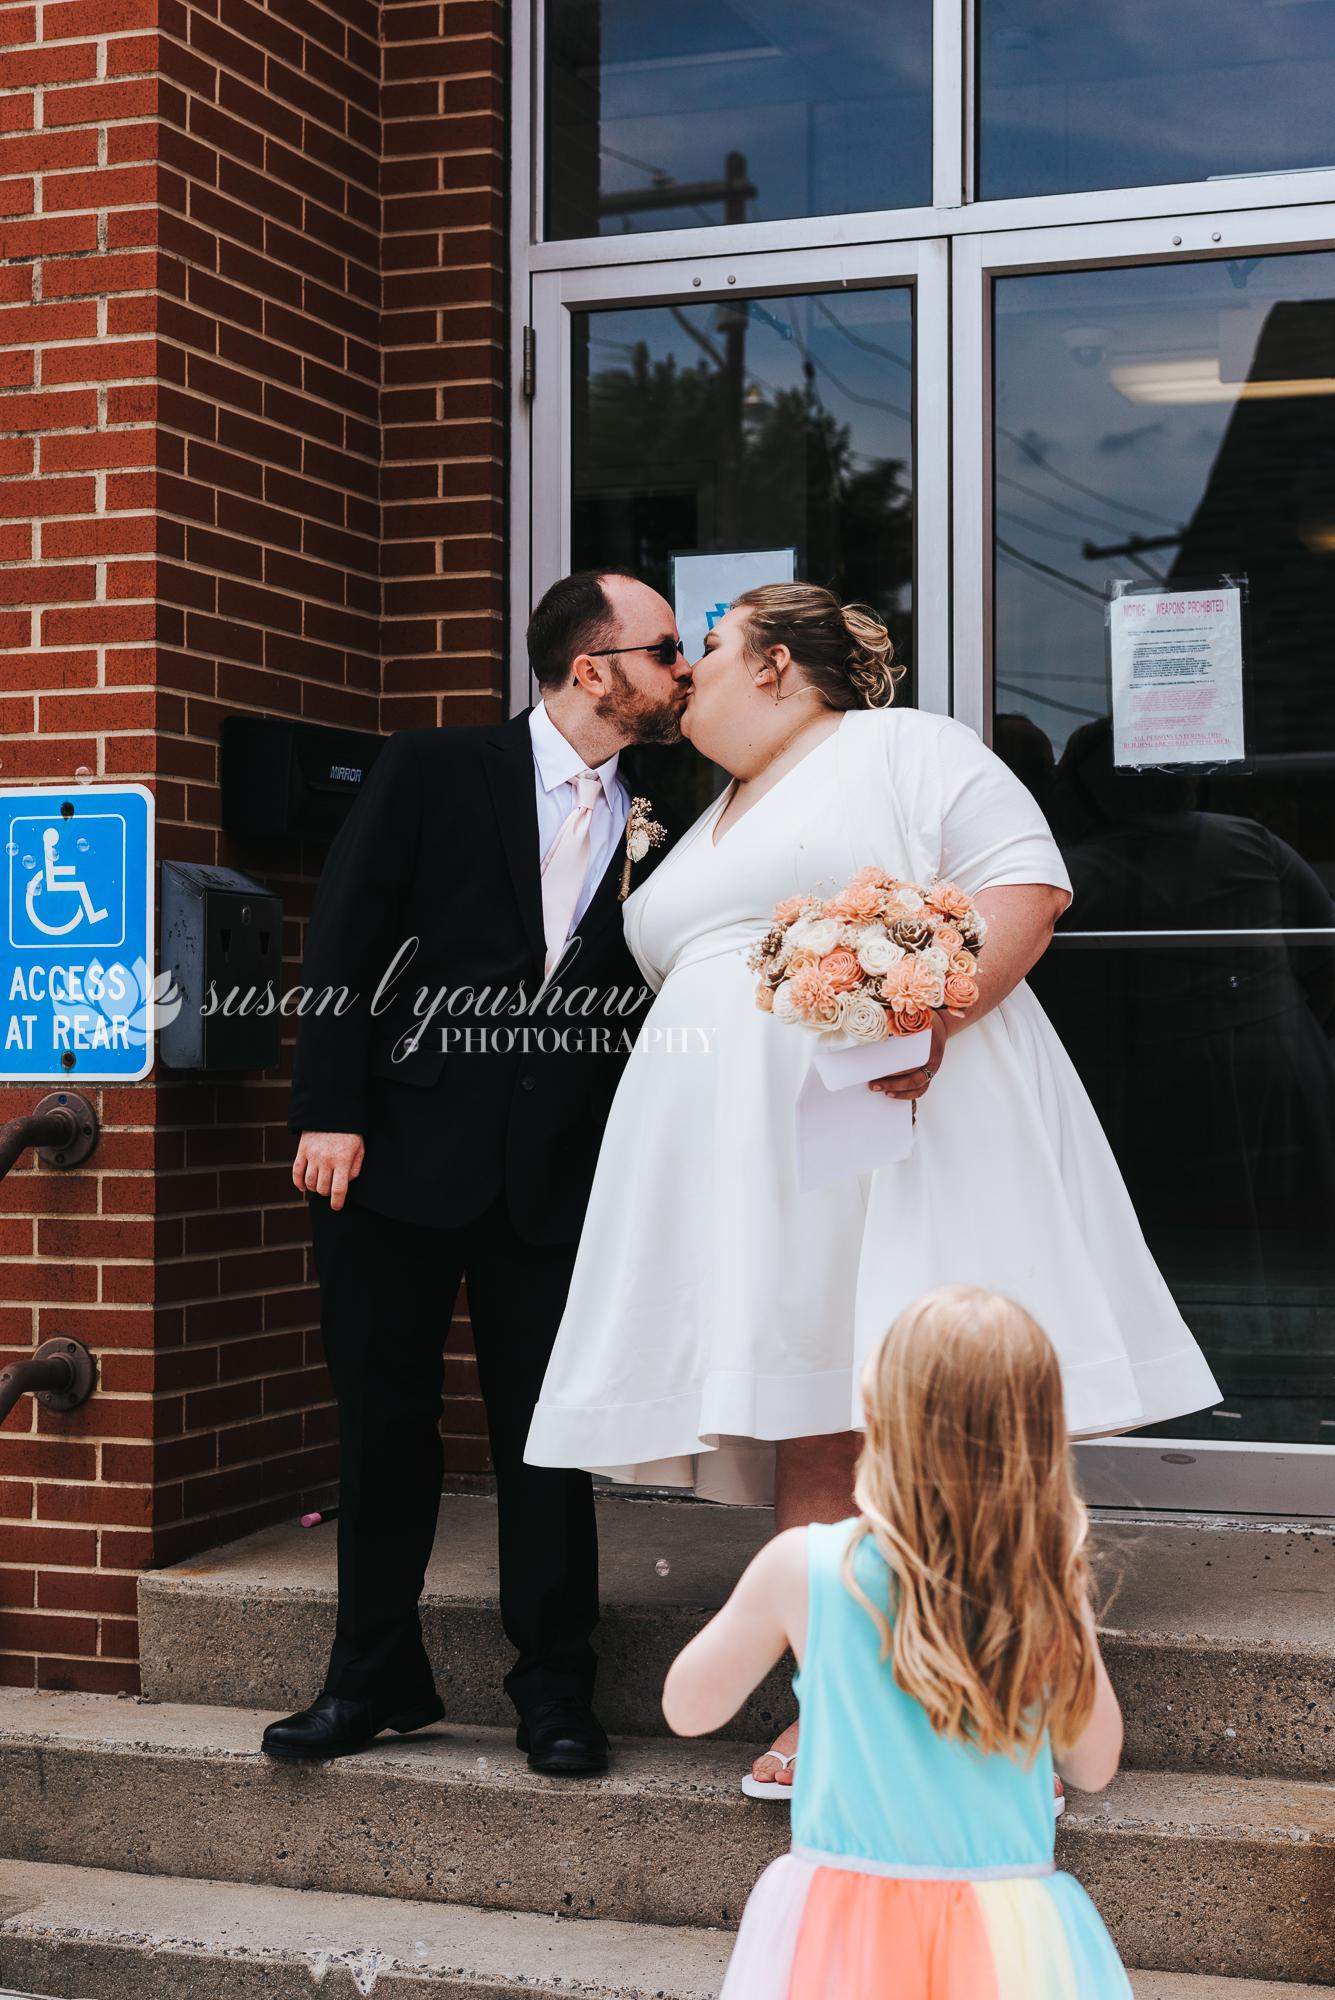 Bill and Sarah Wedding Photos 06-08-2019 SLY Photography -36.jpg